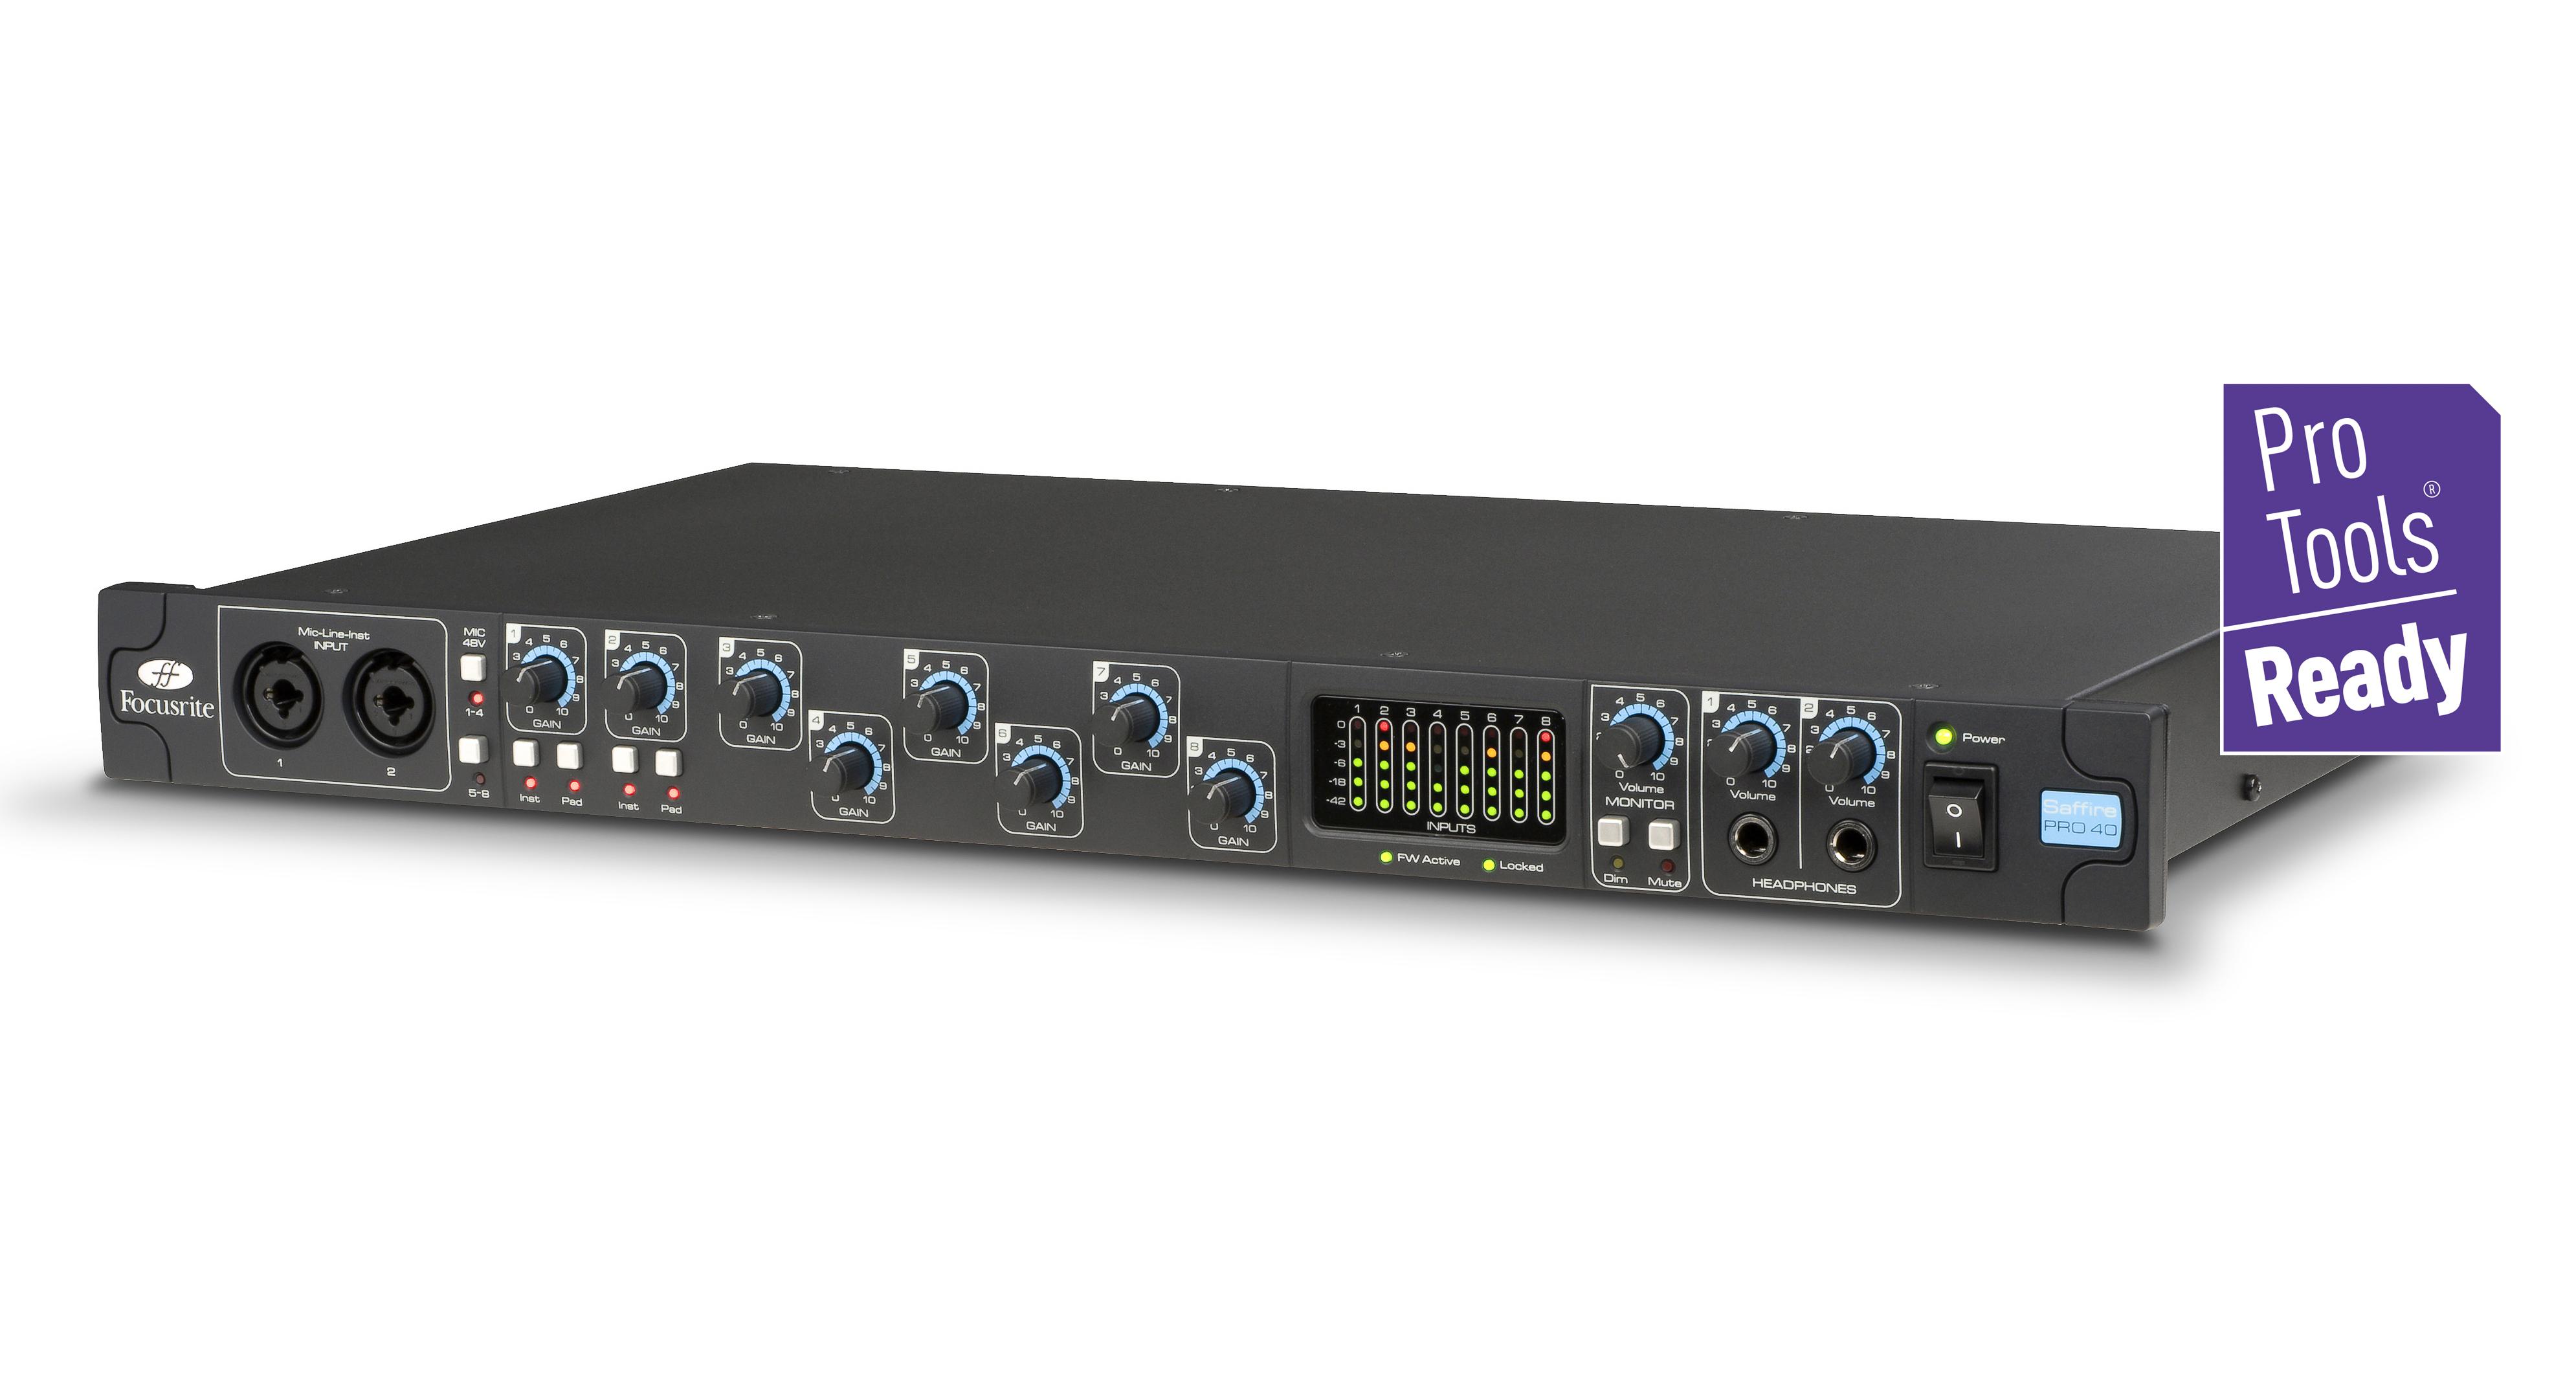 Focusrite Saffire Pro 40 FireWire Audio Interface, 24-bit/96kHz